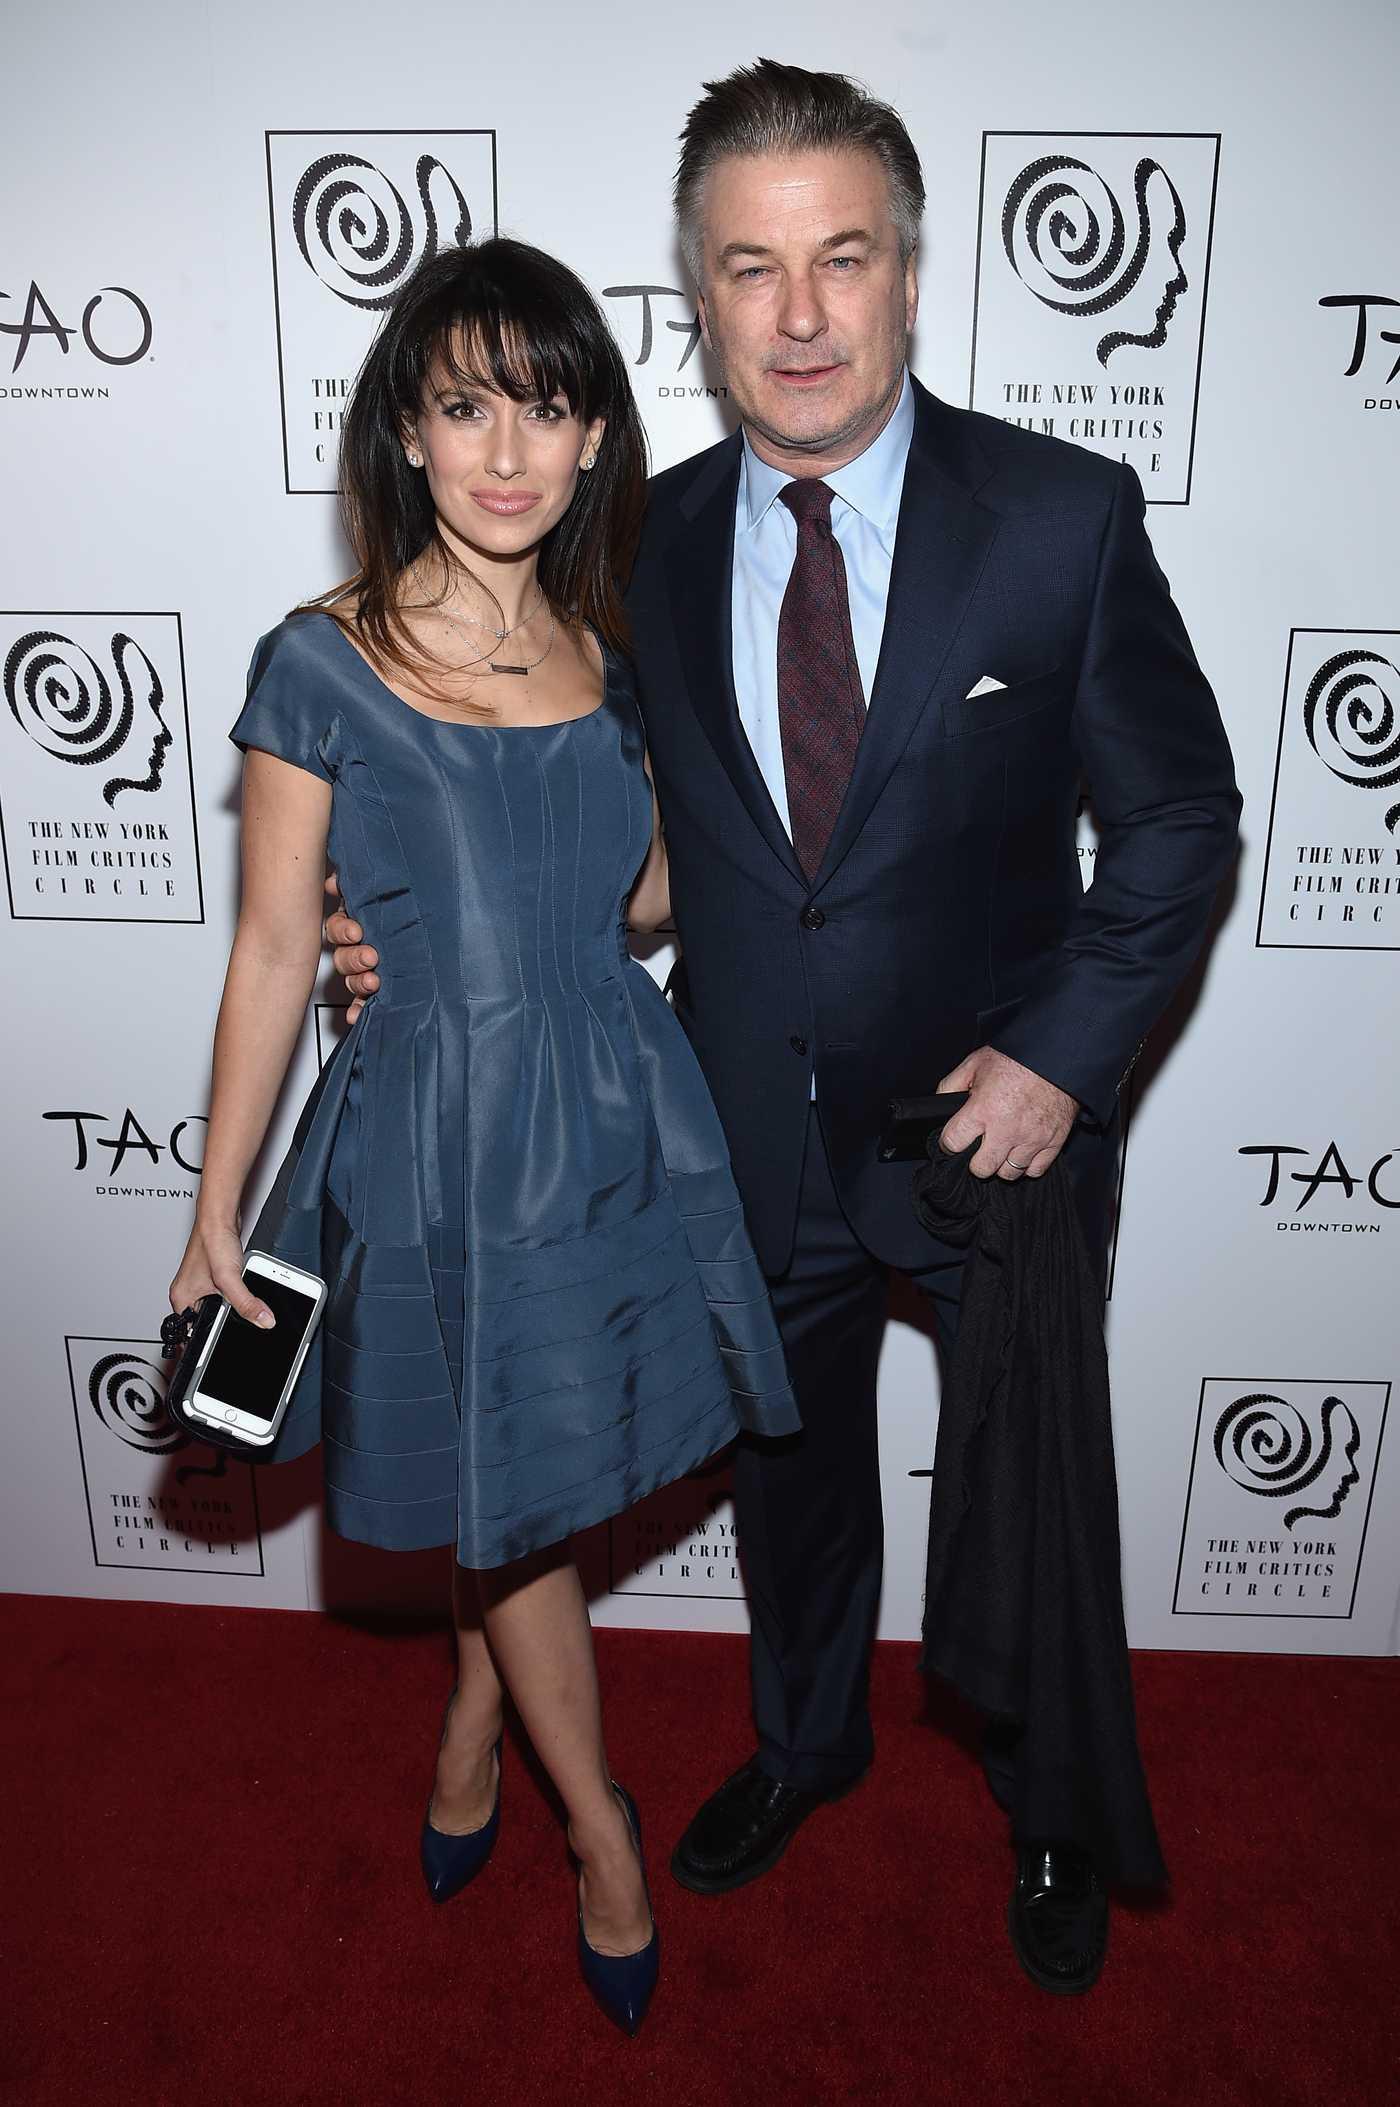 Hilaria Baldwin New York Film Critics Circle Awards in New York